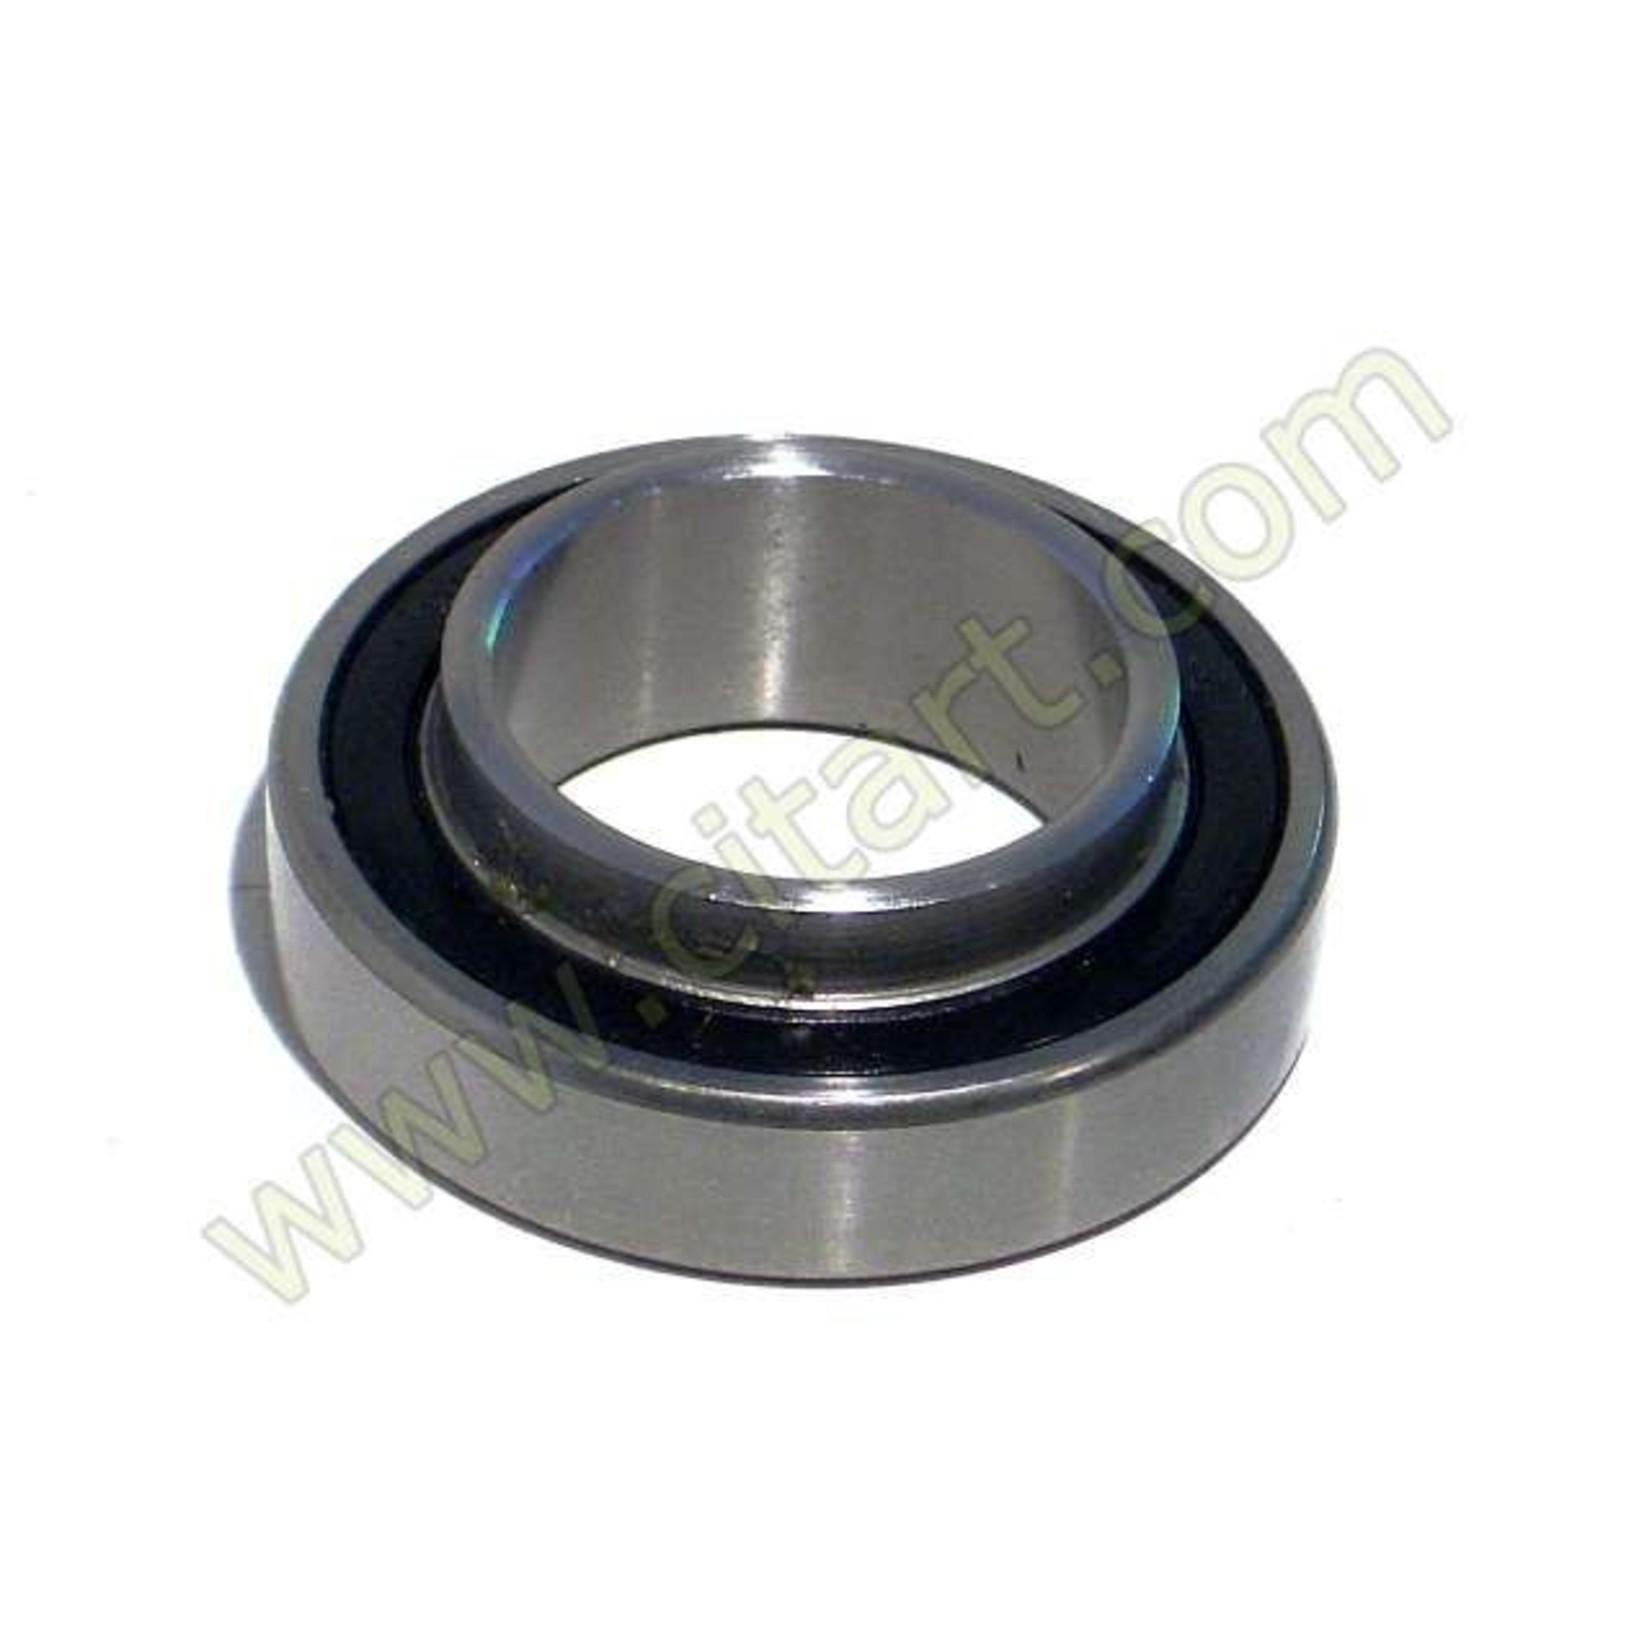 Bearing clutch thrust cast iron 10/72-11/72